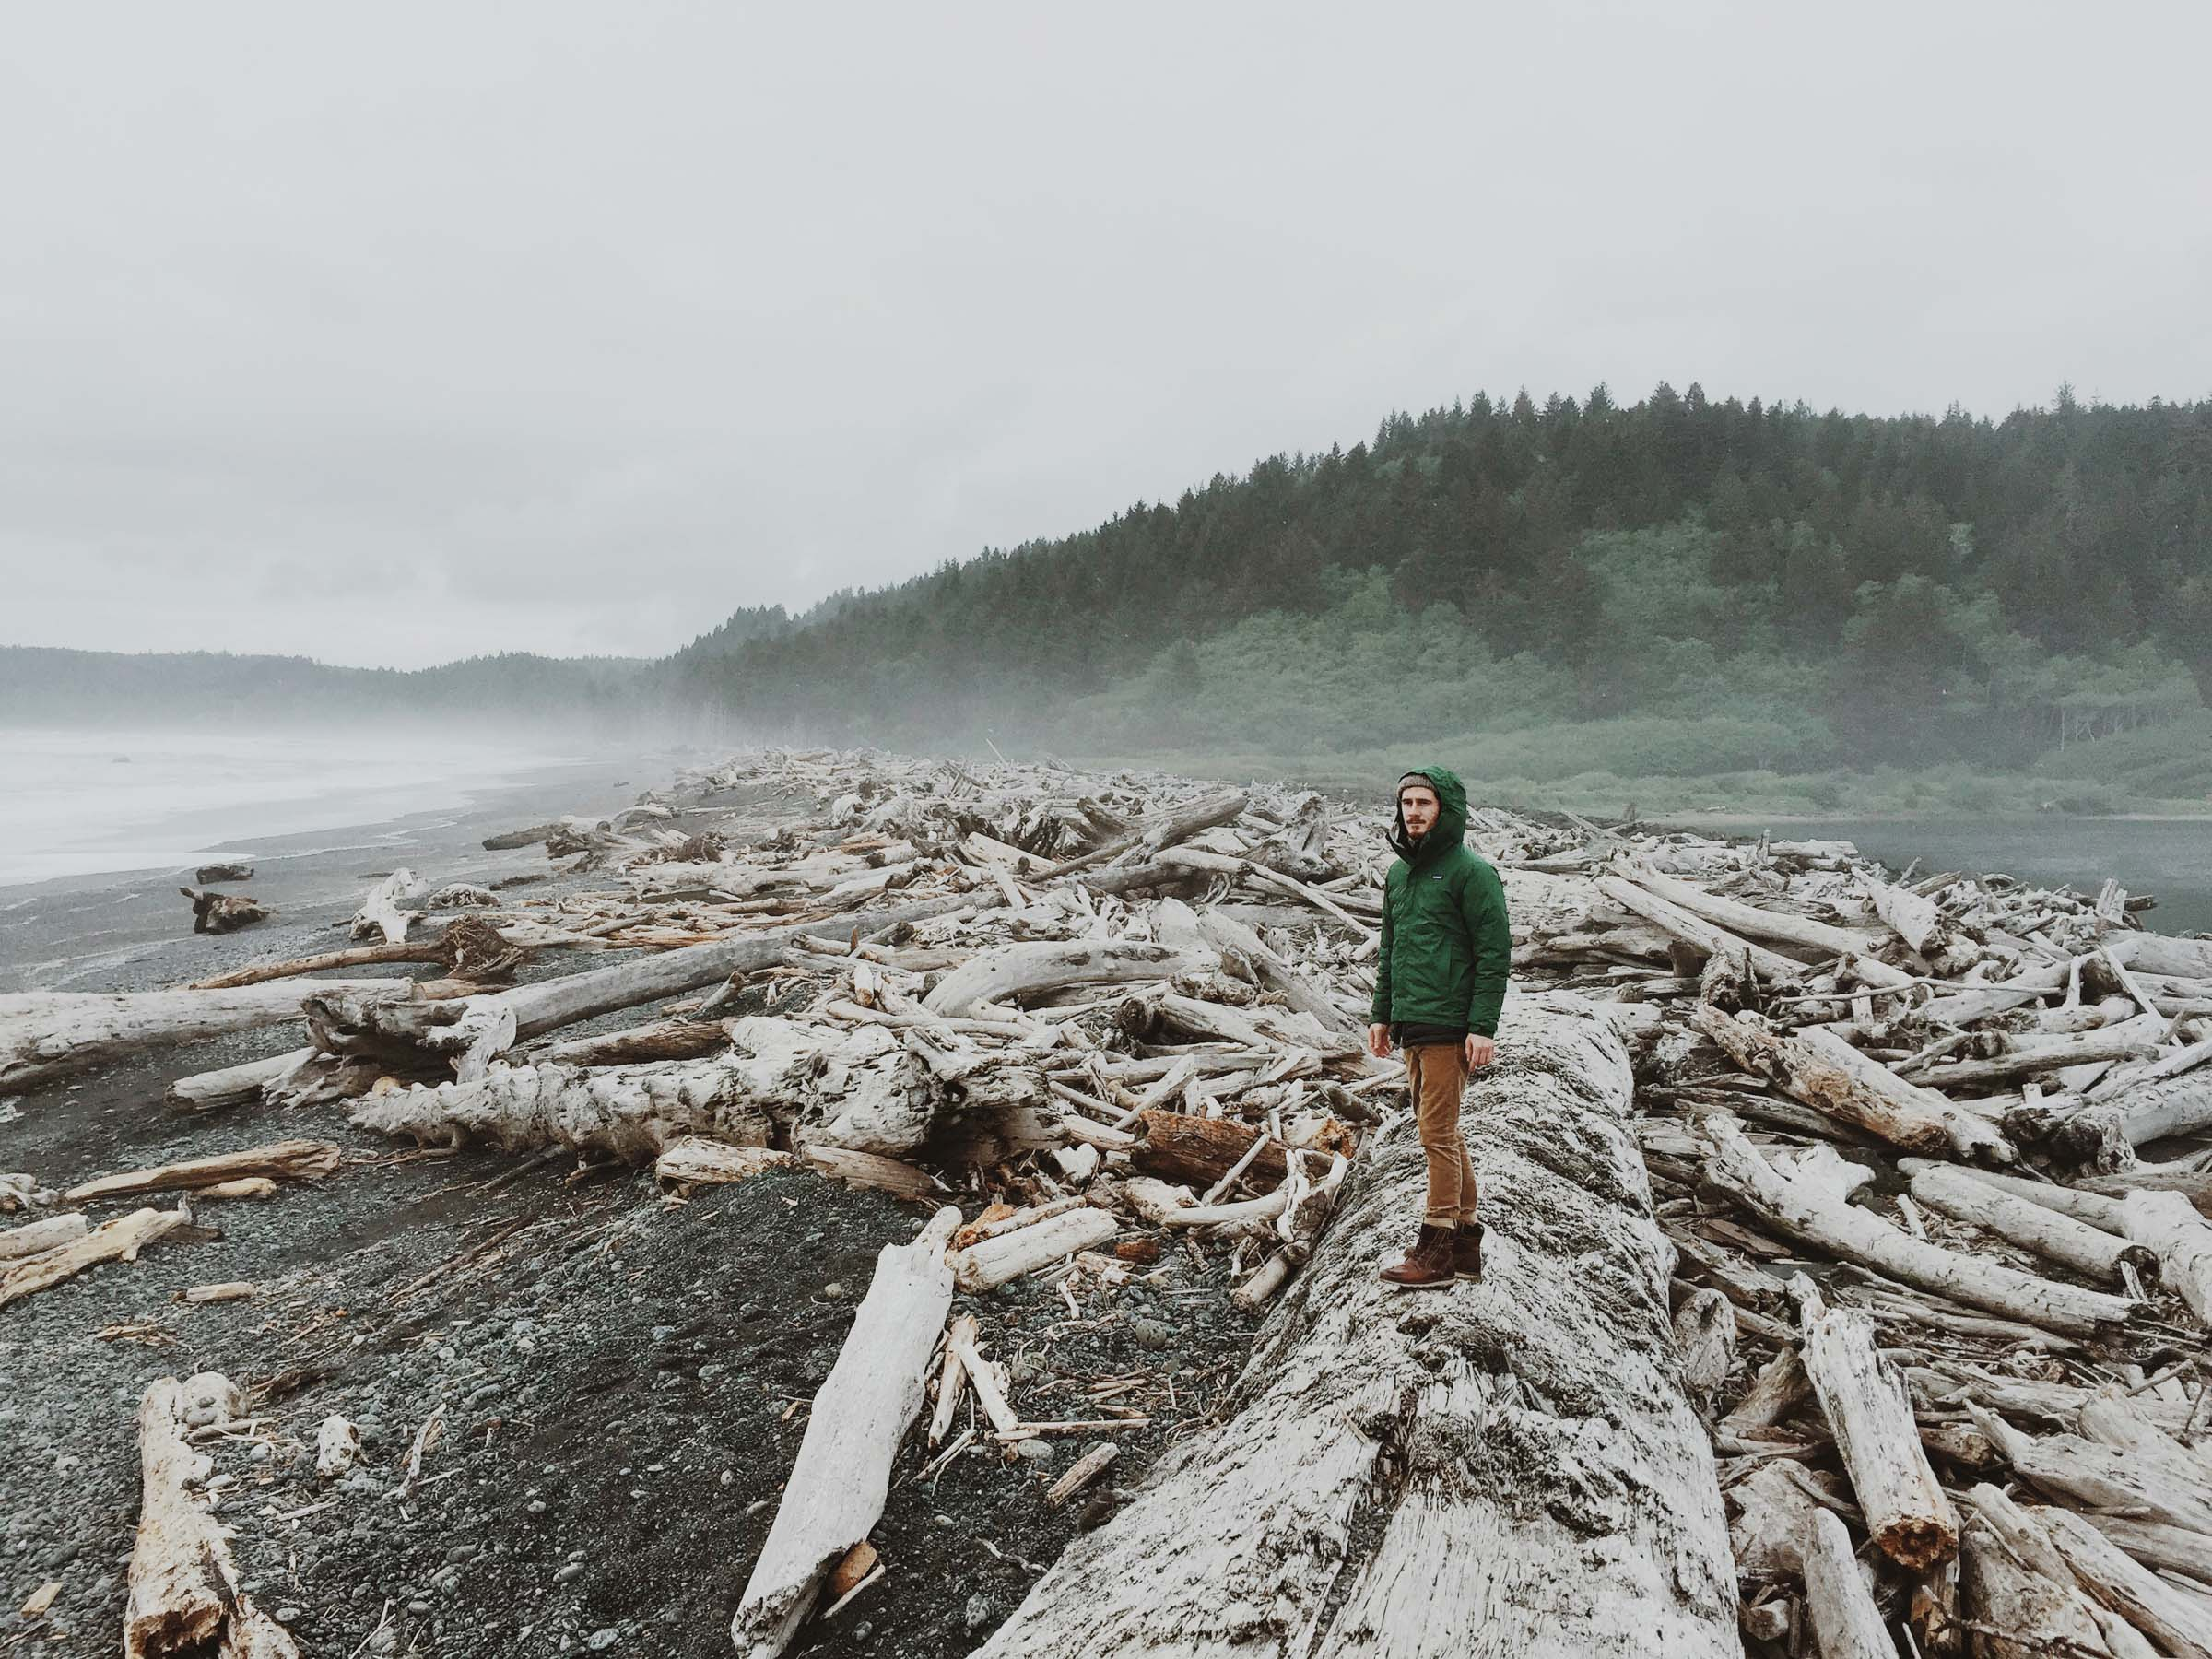 Outdoor adventure portrait La Push | Katch Silva